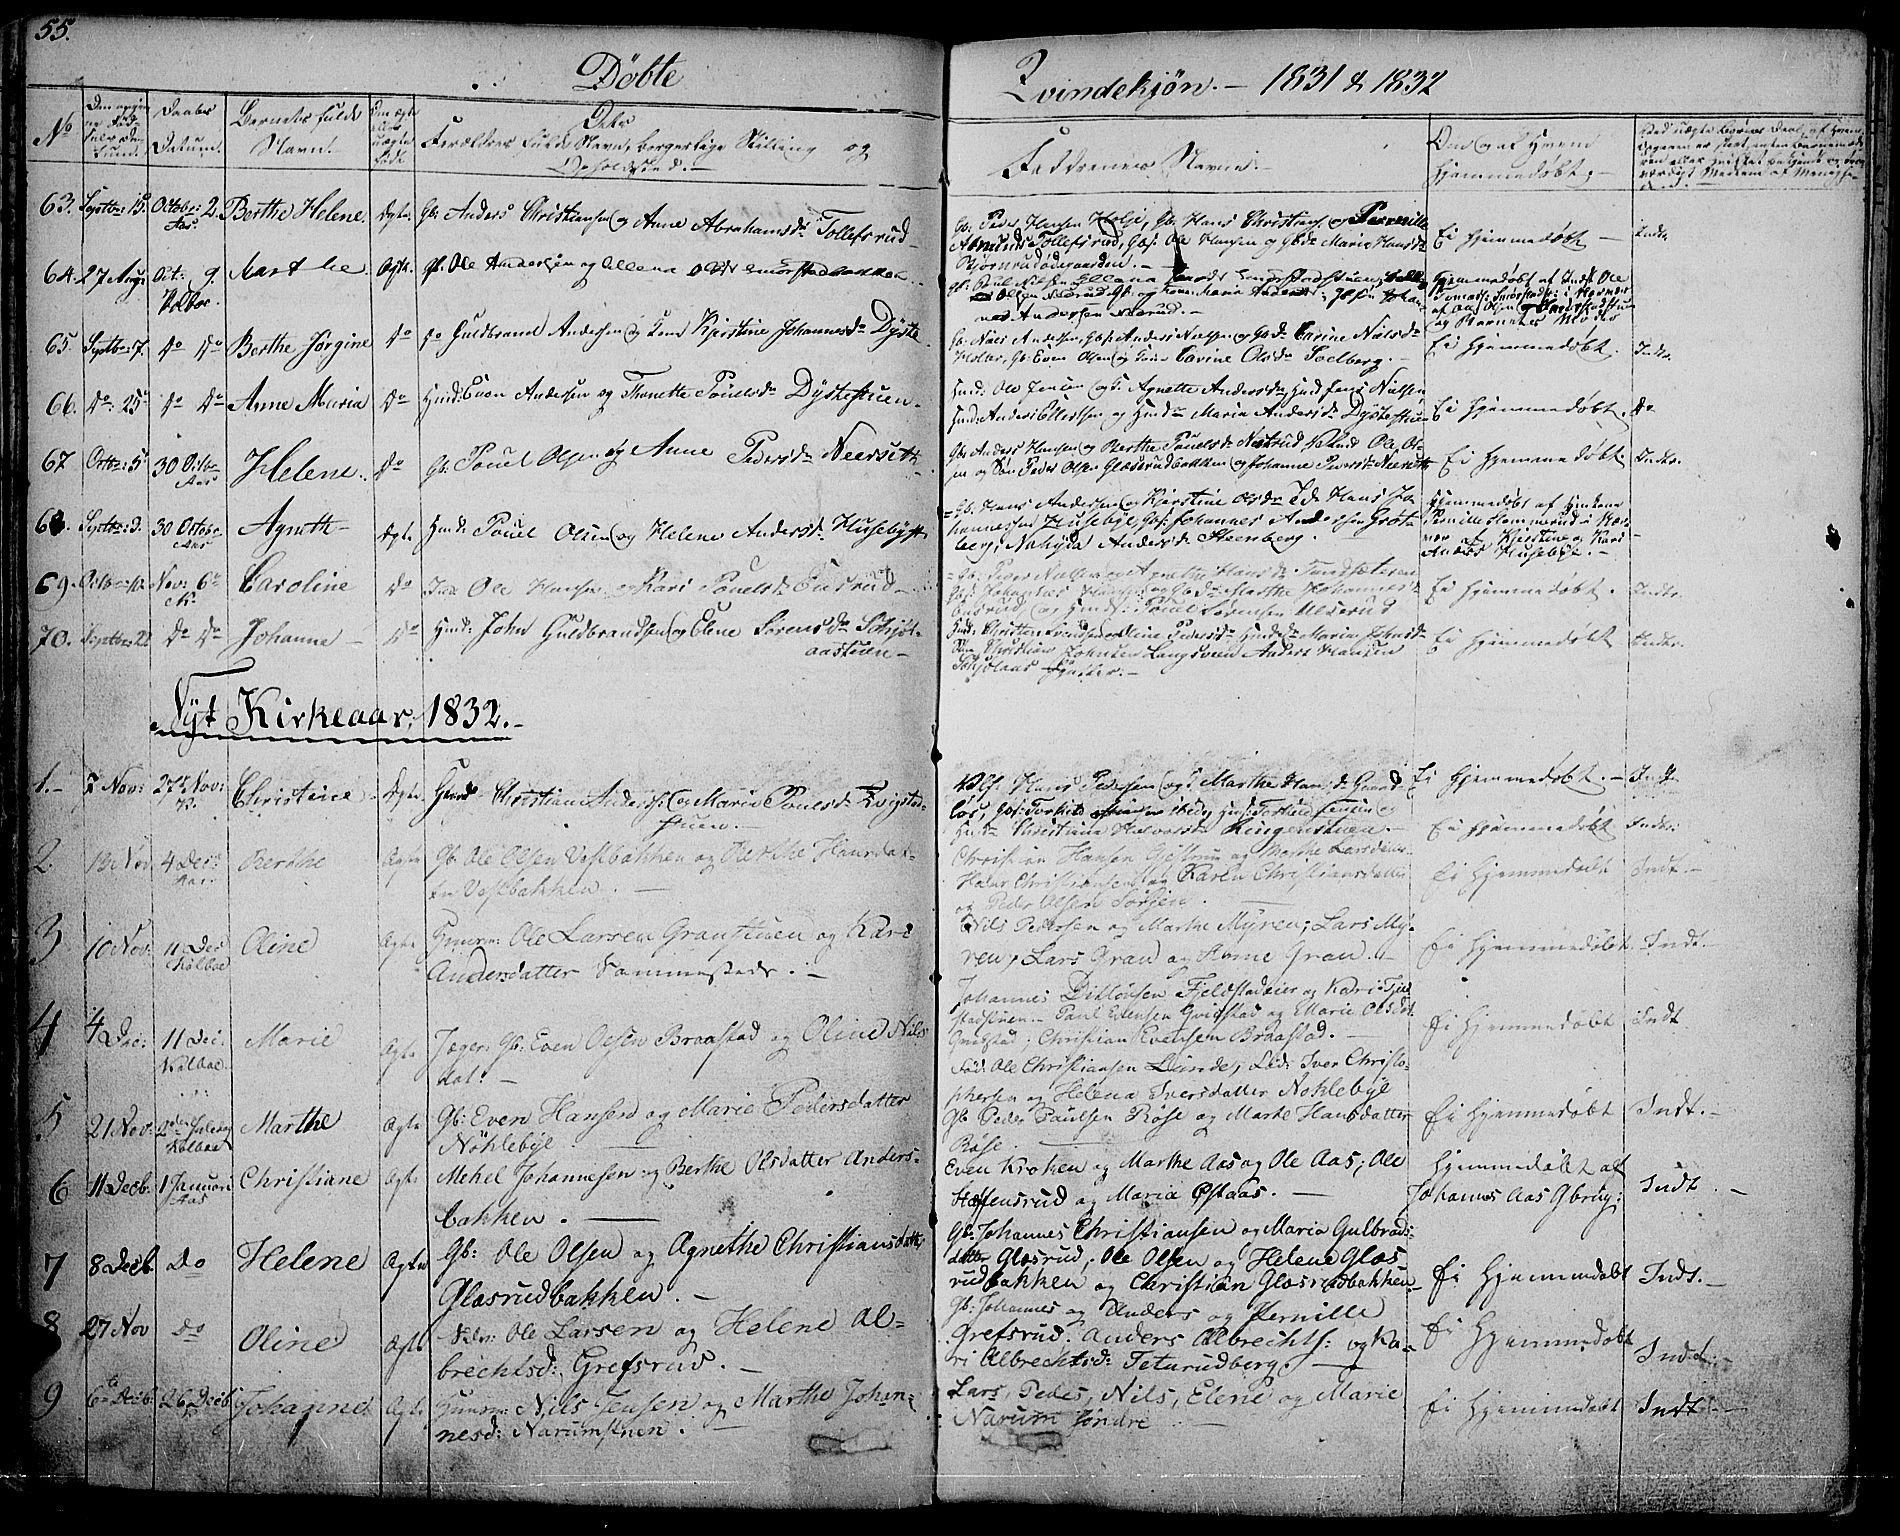 SAH, Vestre Toten prestekontor, H/Ha/Haa/L0002: Ministerialbok nr. 2, 1825-1837, s. 55